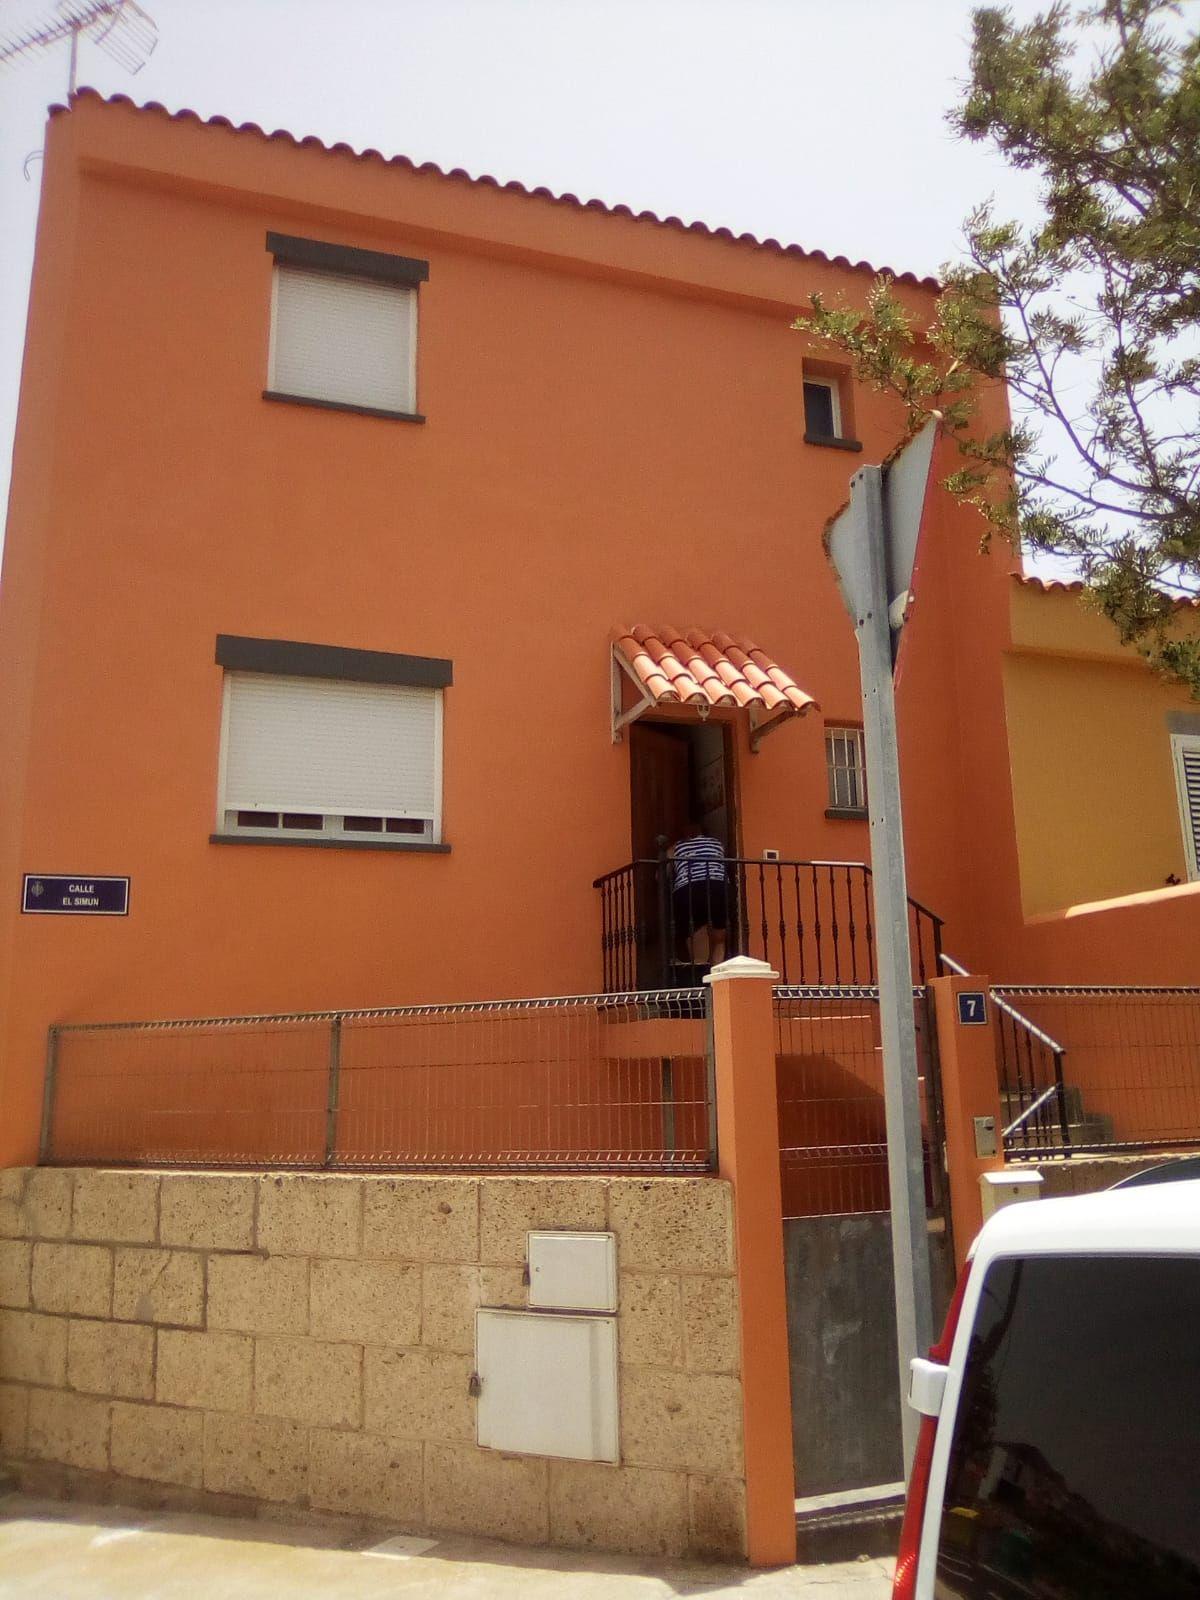 Pintura de fachadas de viviendas en Tenerife